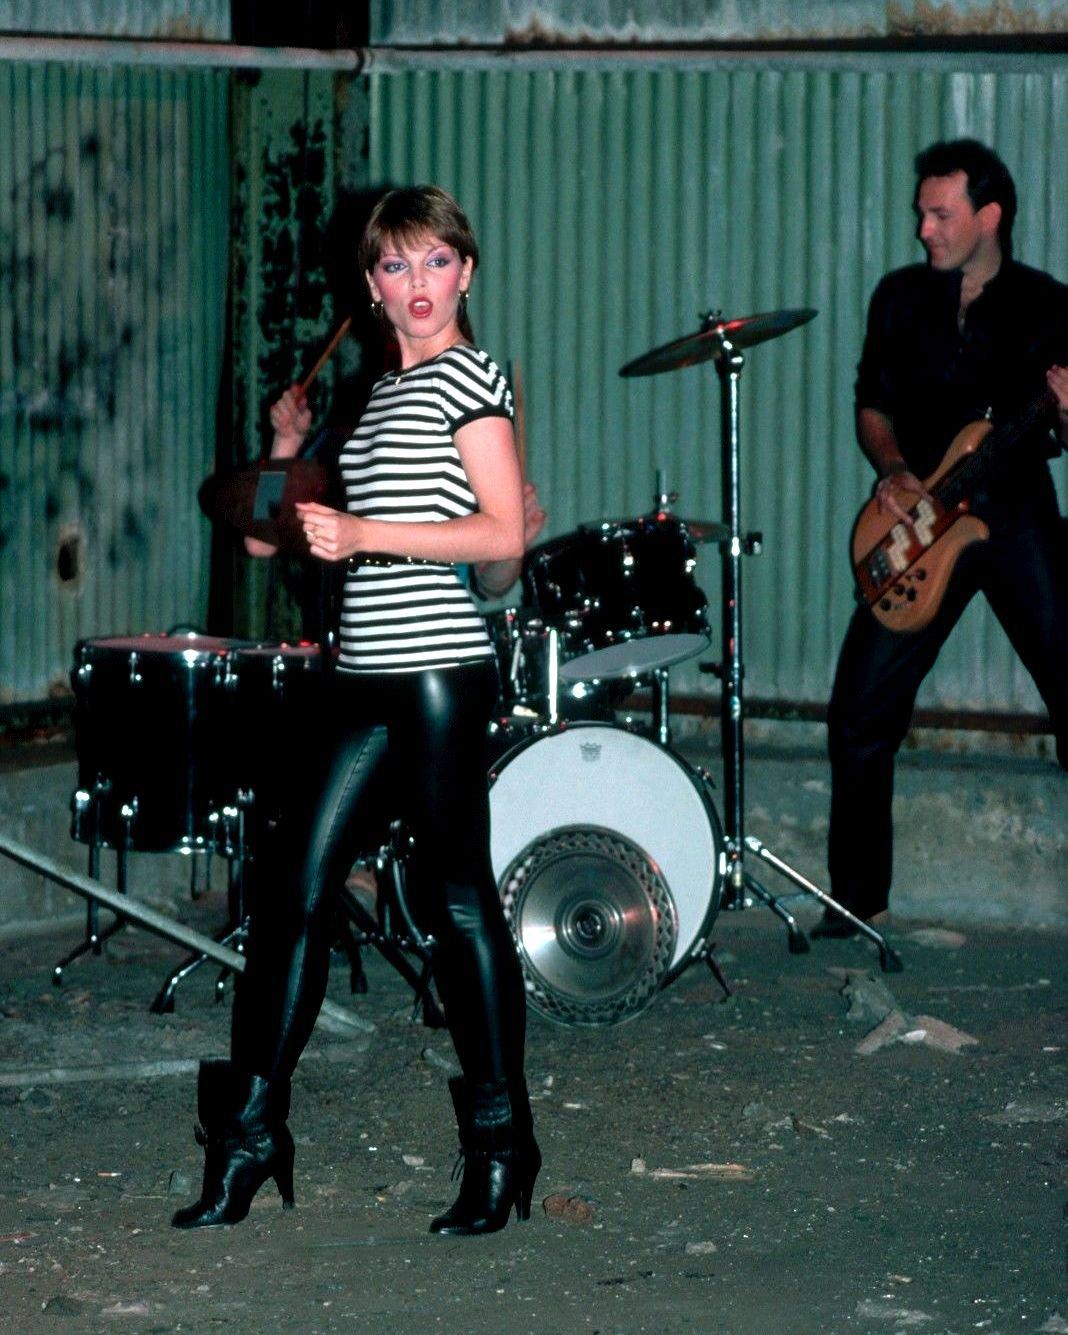 PAT BENATAR ROCK SINGER - 8X10 PUBLICITY PHOTO (DA-042)